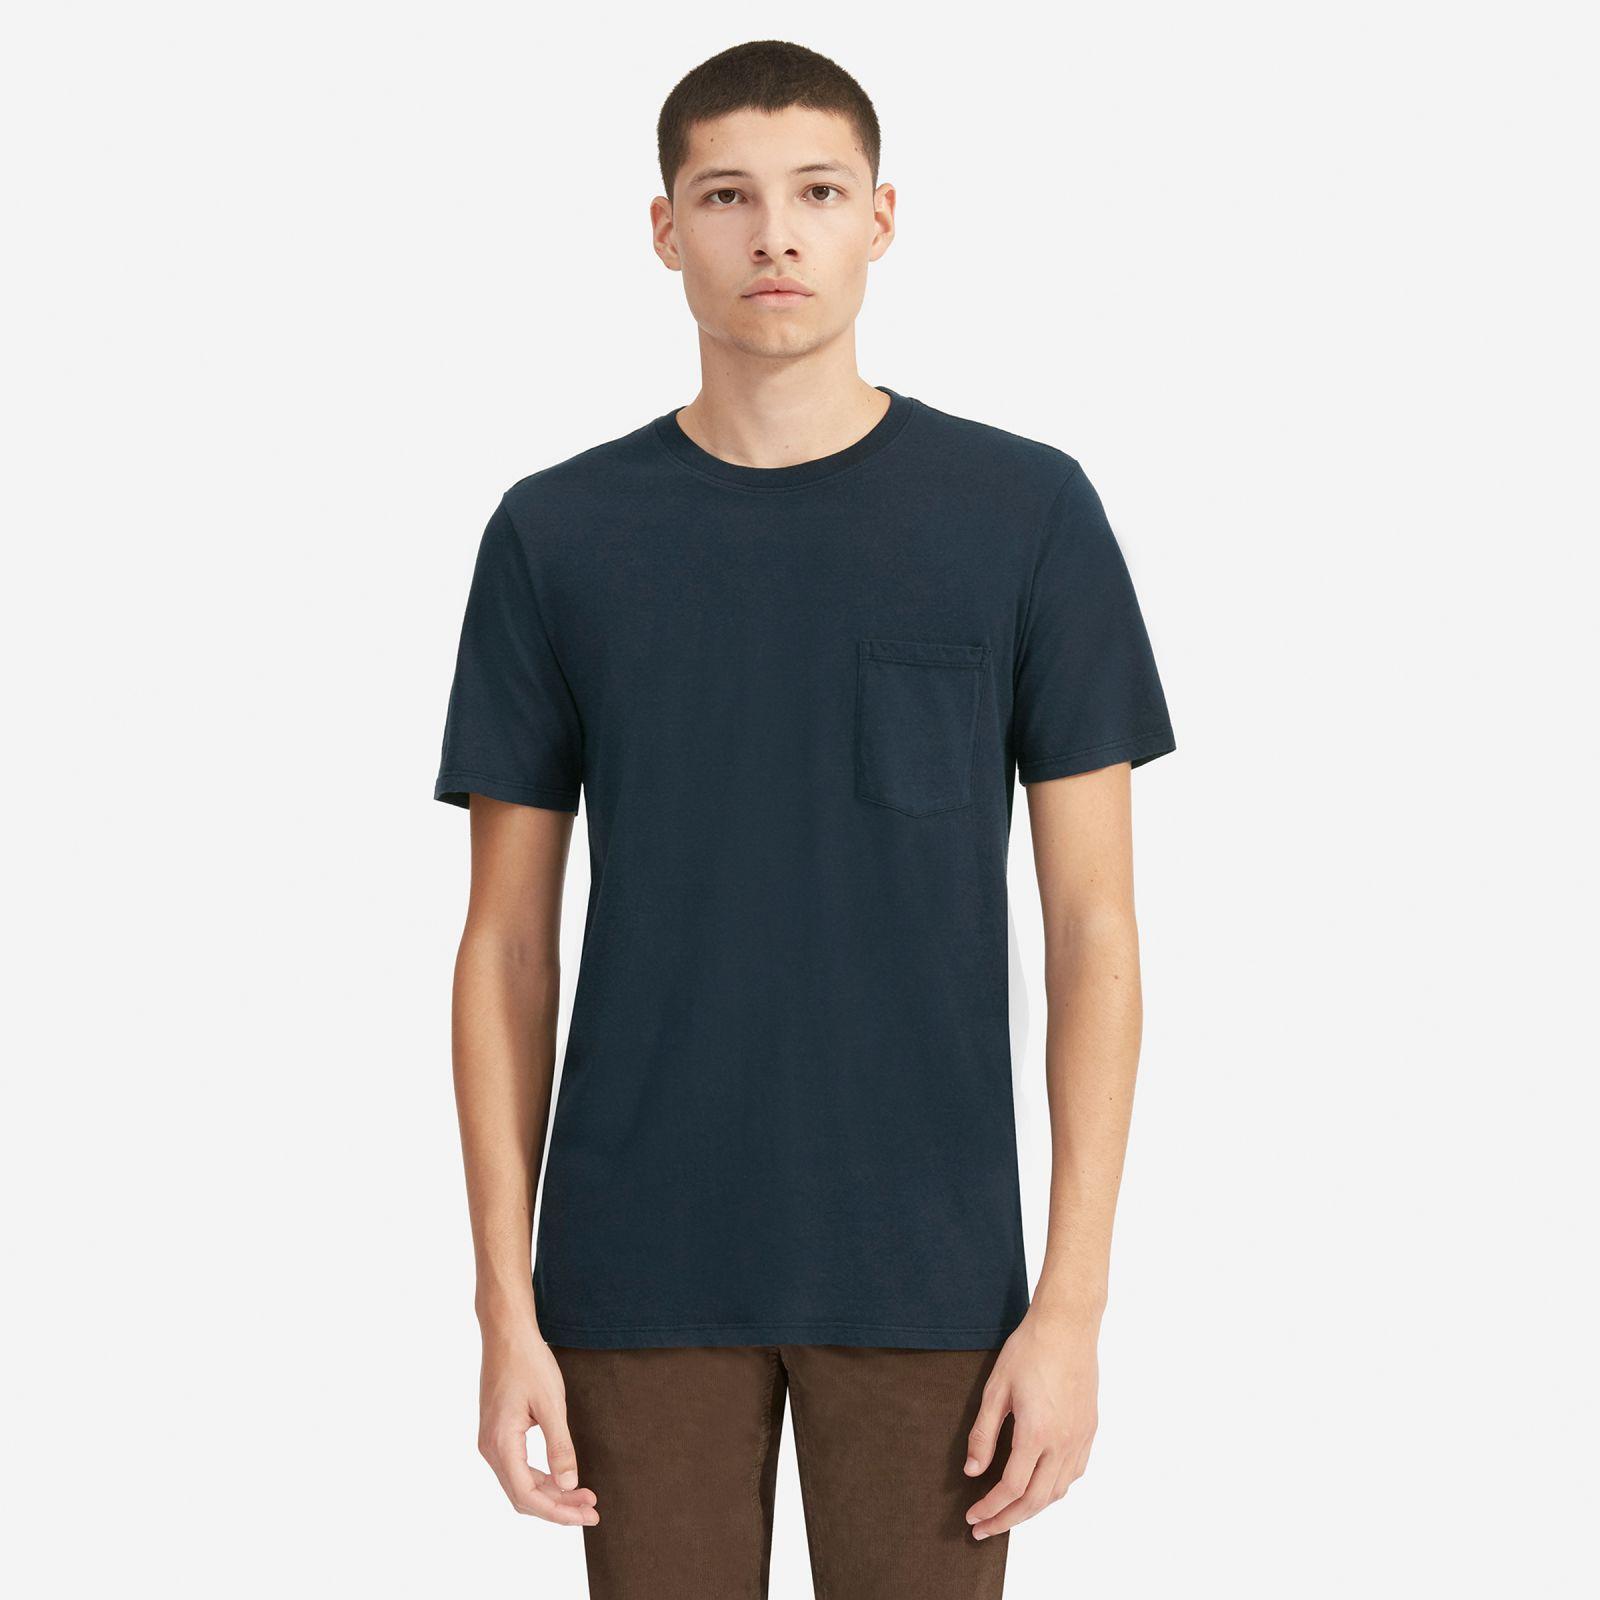 men's cotton pocket t-shirt | uniform by everlane in true navy, size xs